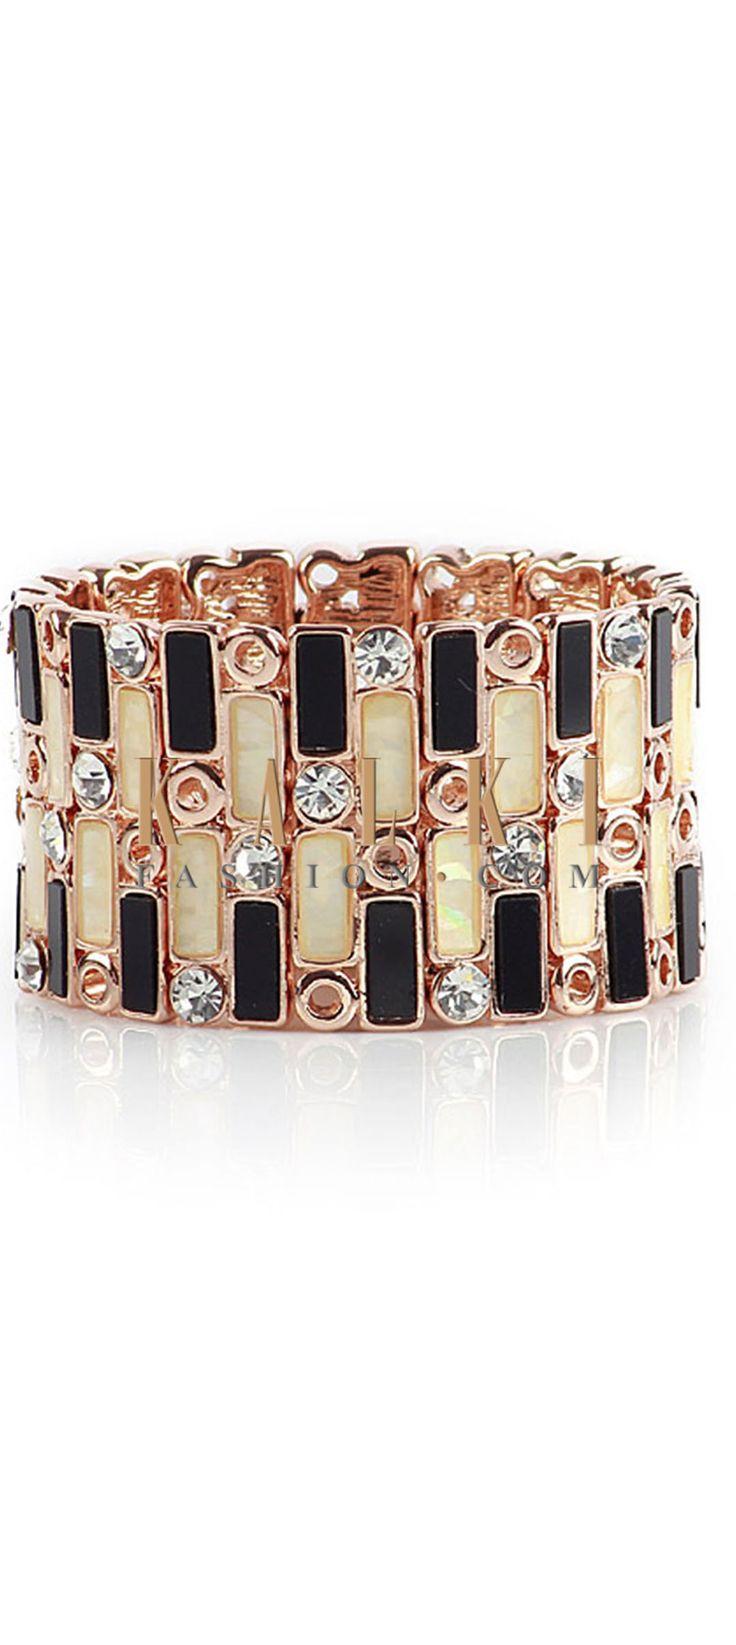 Buy Online from the link below http://www.kalkifashion.com/high-shine-rose-gold-bracelet.html